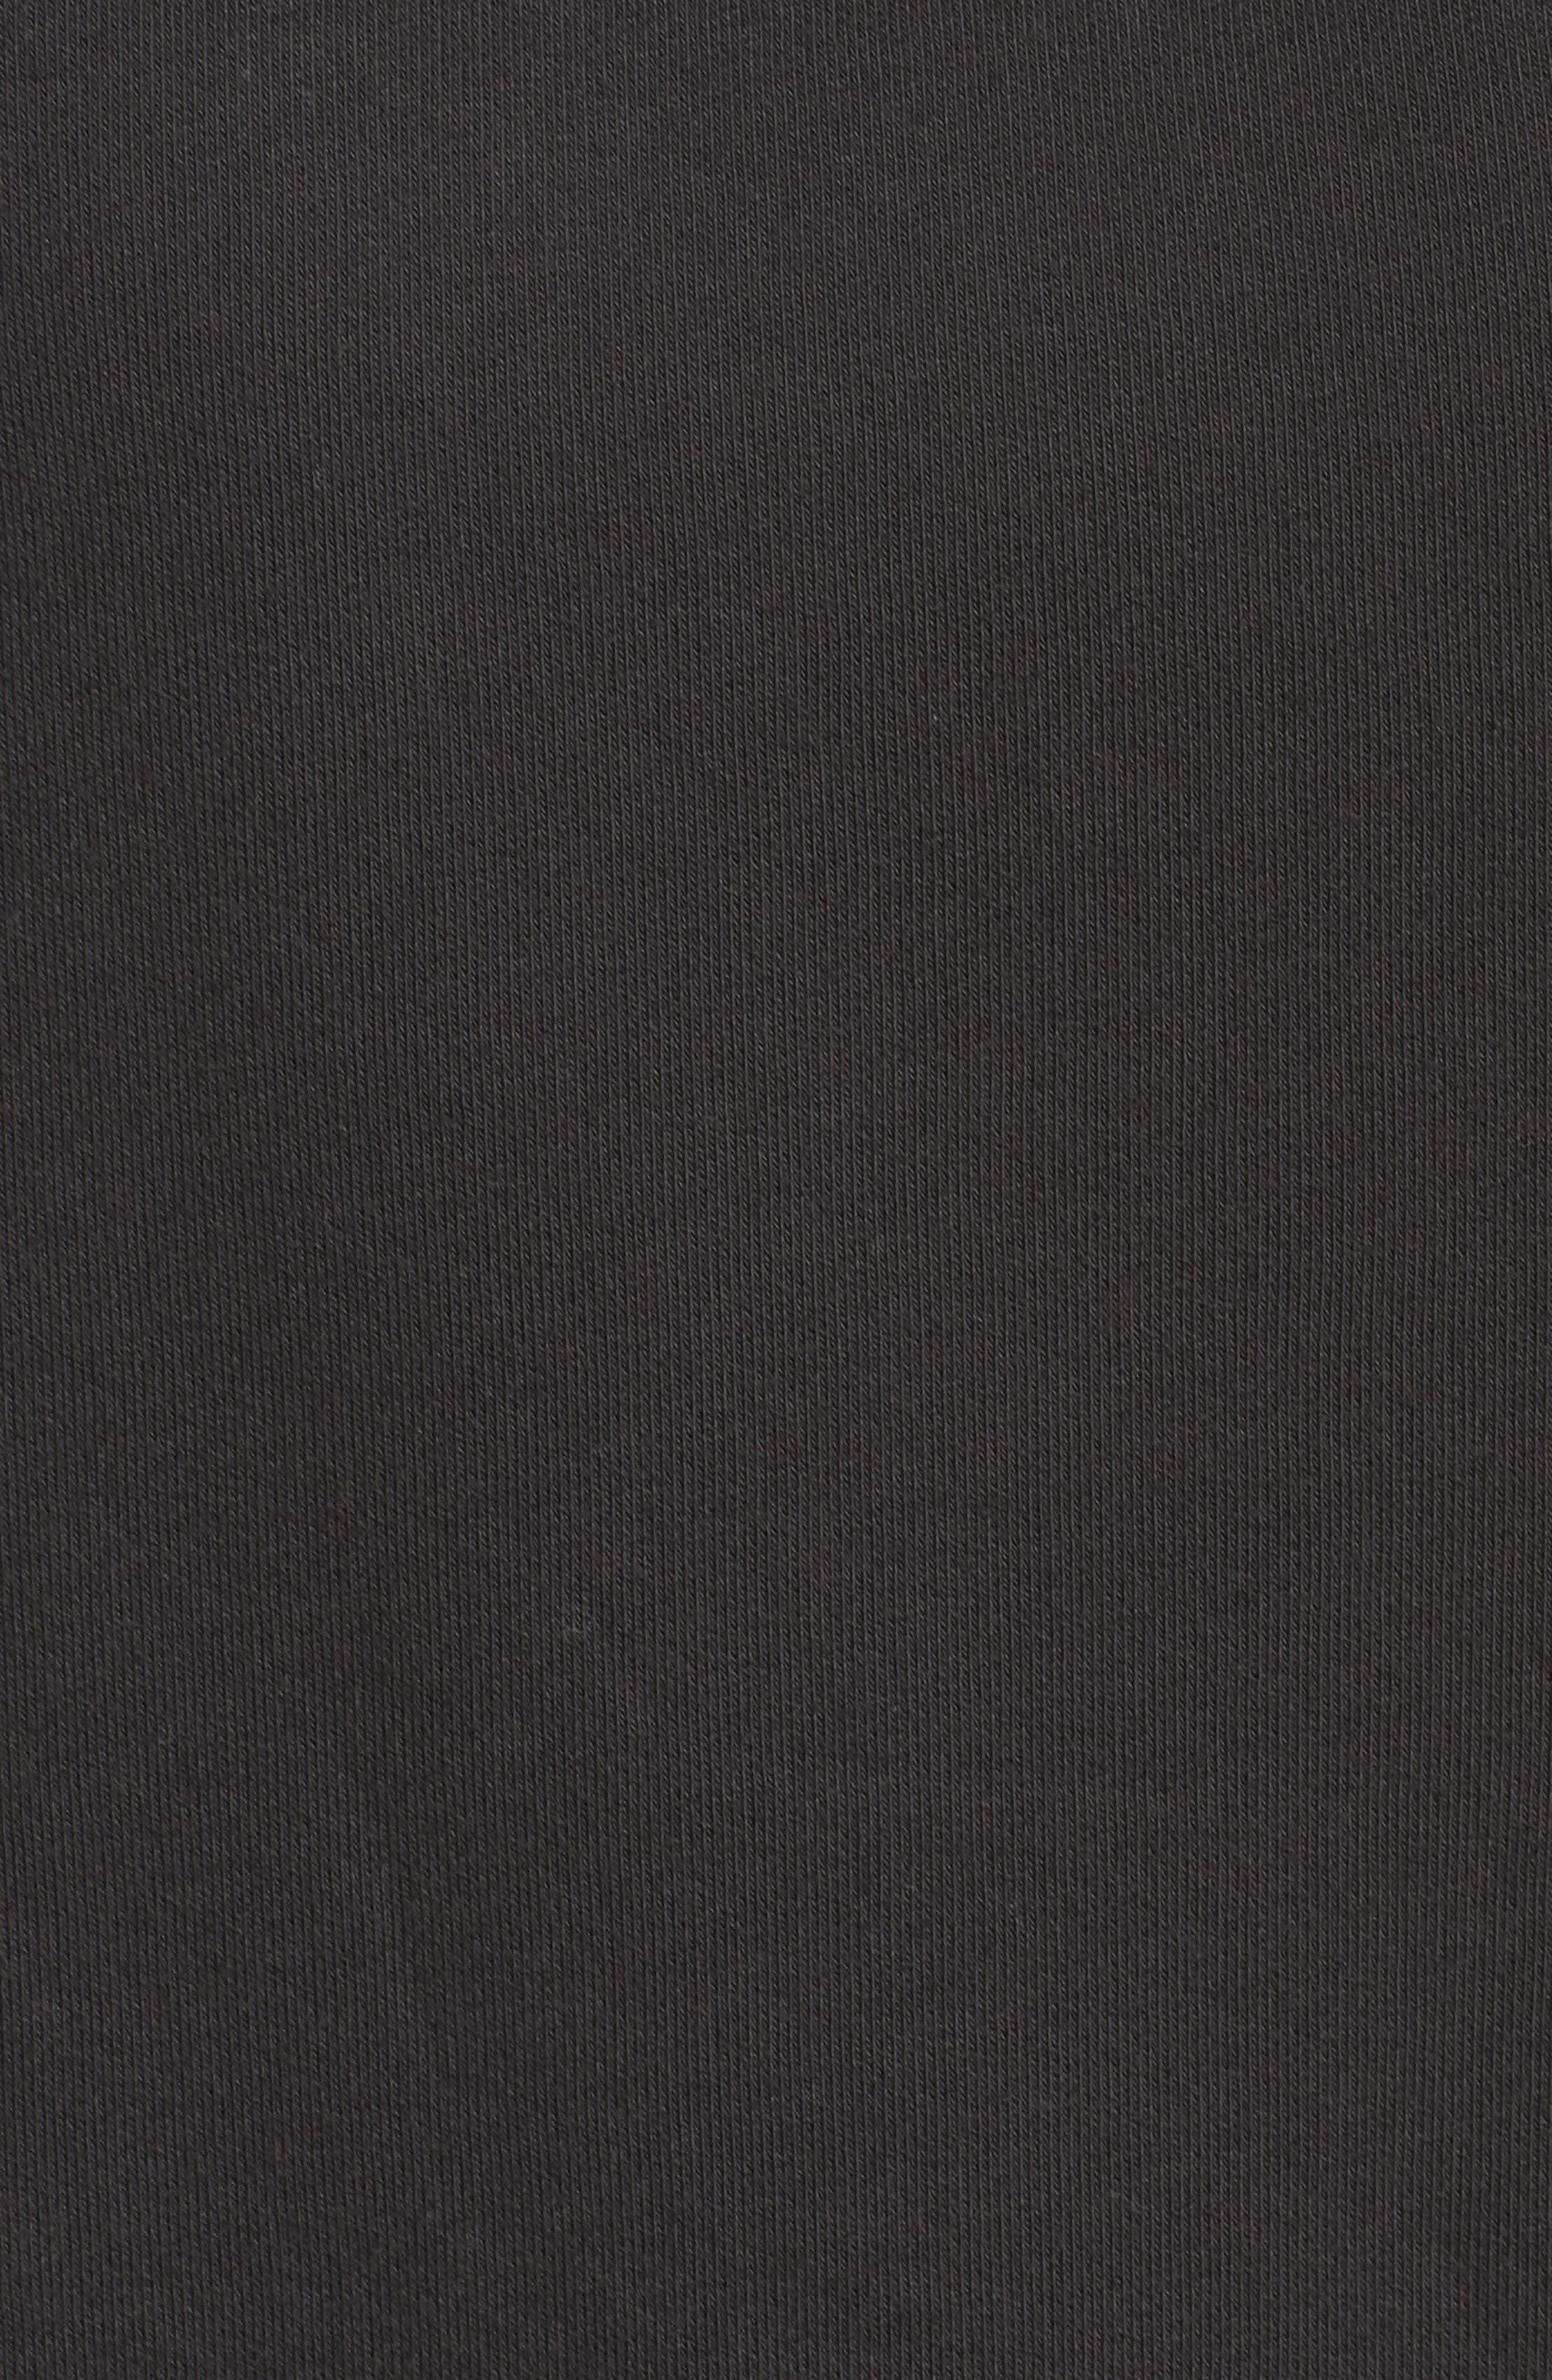 Lounge Sweatshirt,                             Alternate thumbnail 5, color,                             Black